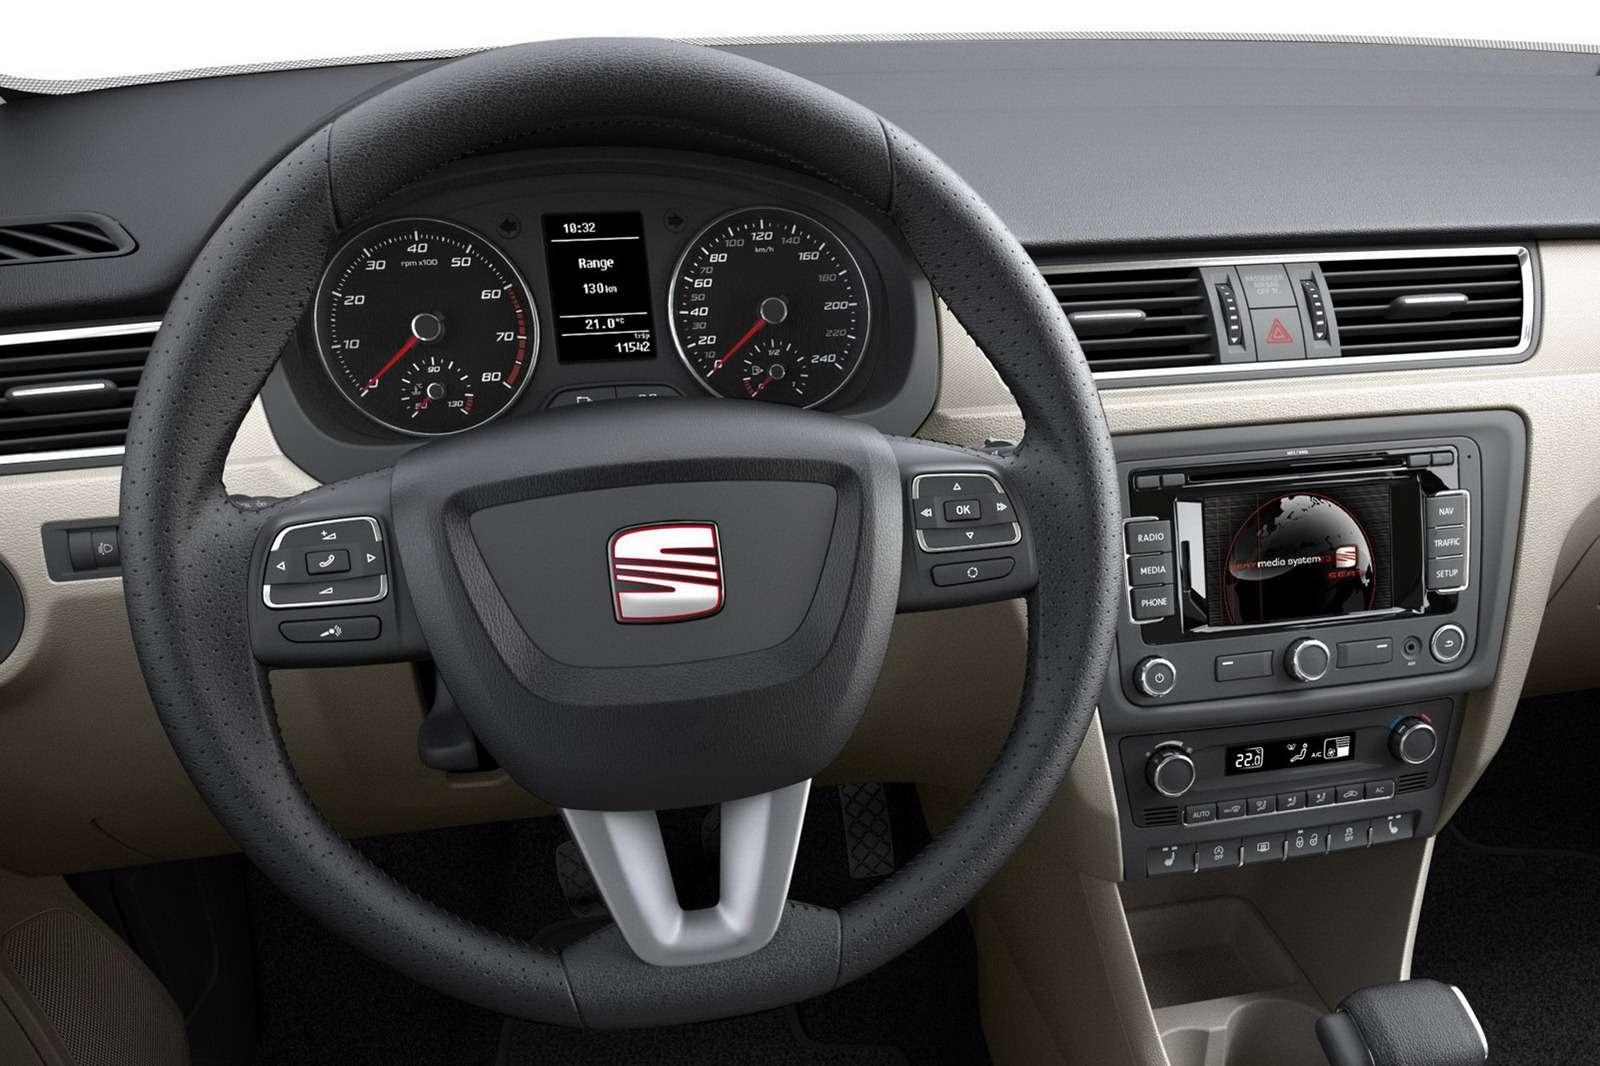 SEAT Toledo 2013